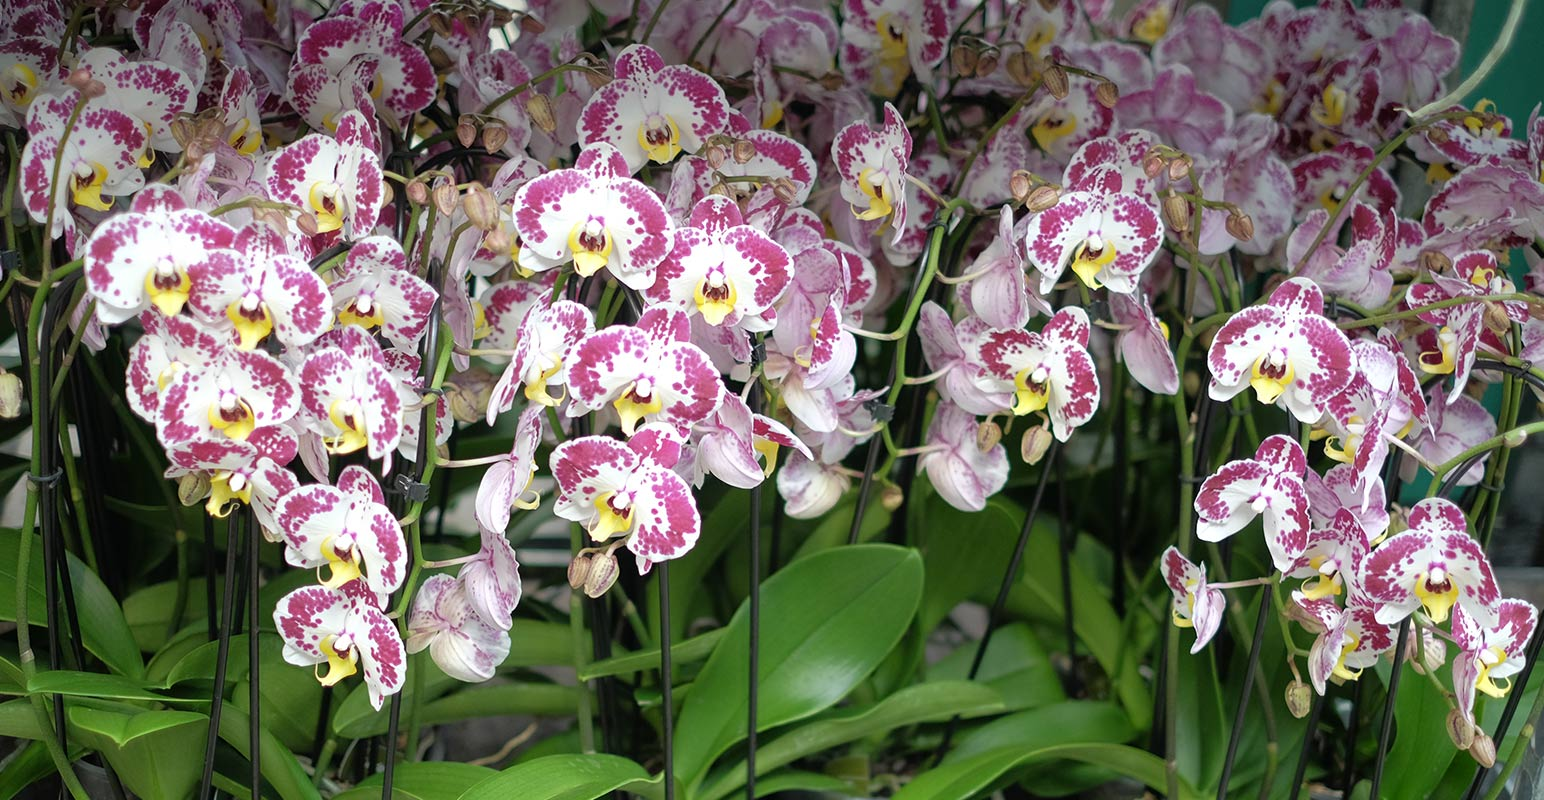 LGD - Grossiste en plantes